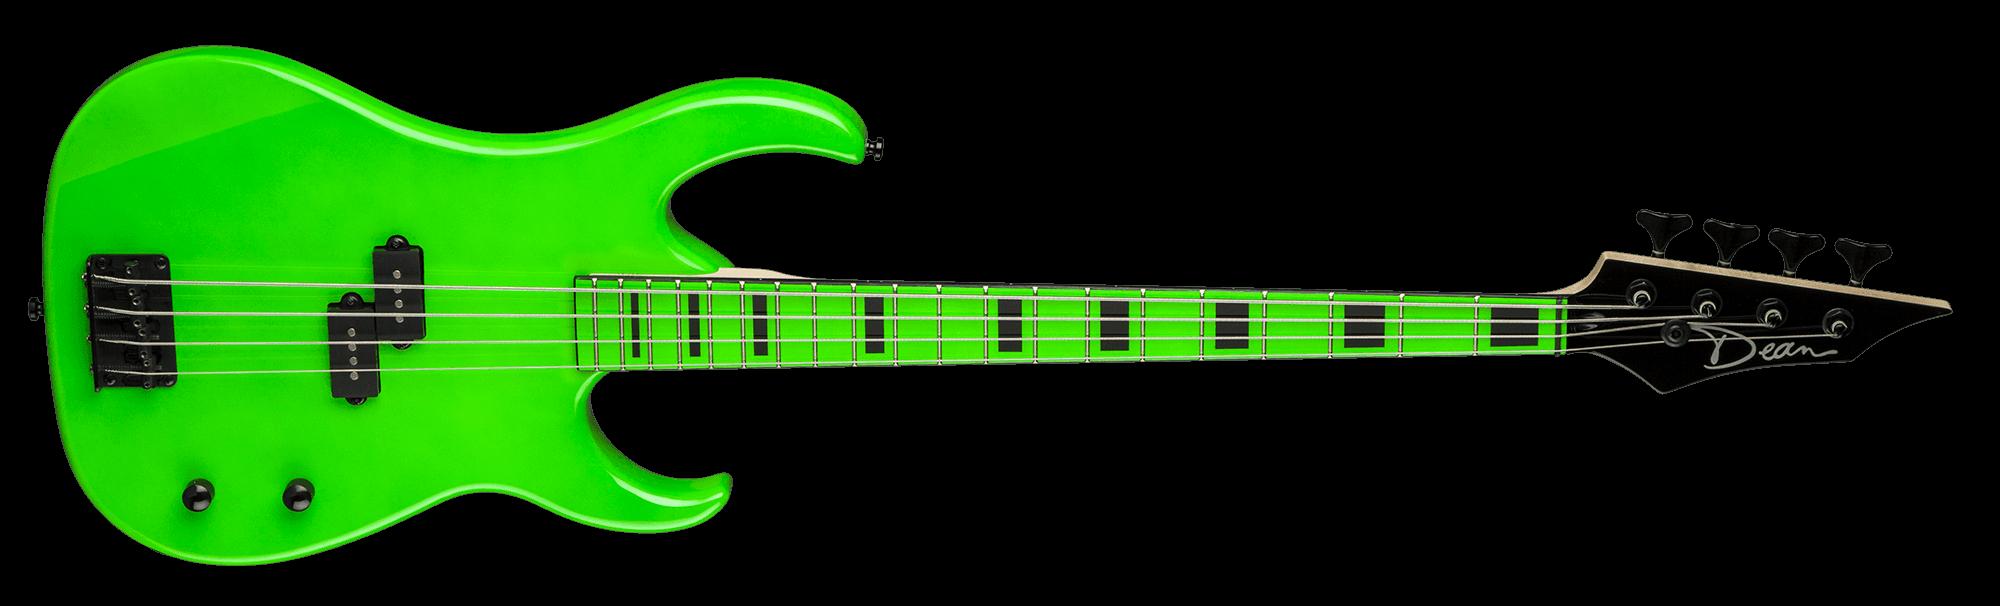 Clipart guitar colorful guitar. Custom zone nuclear green